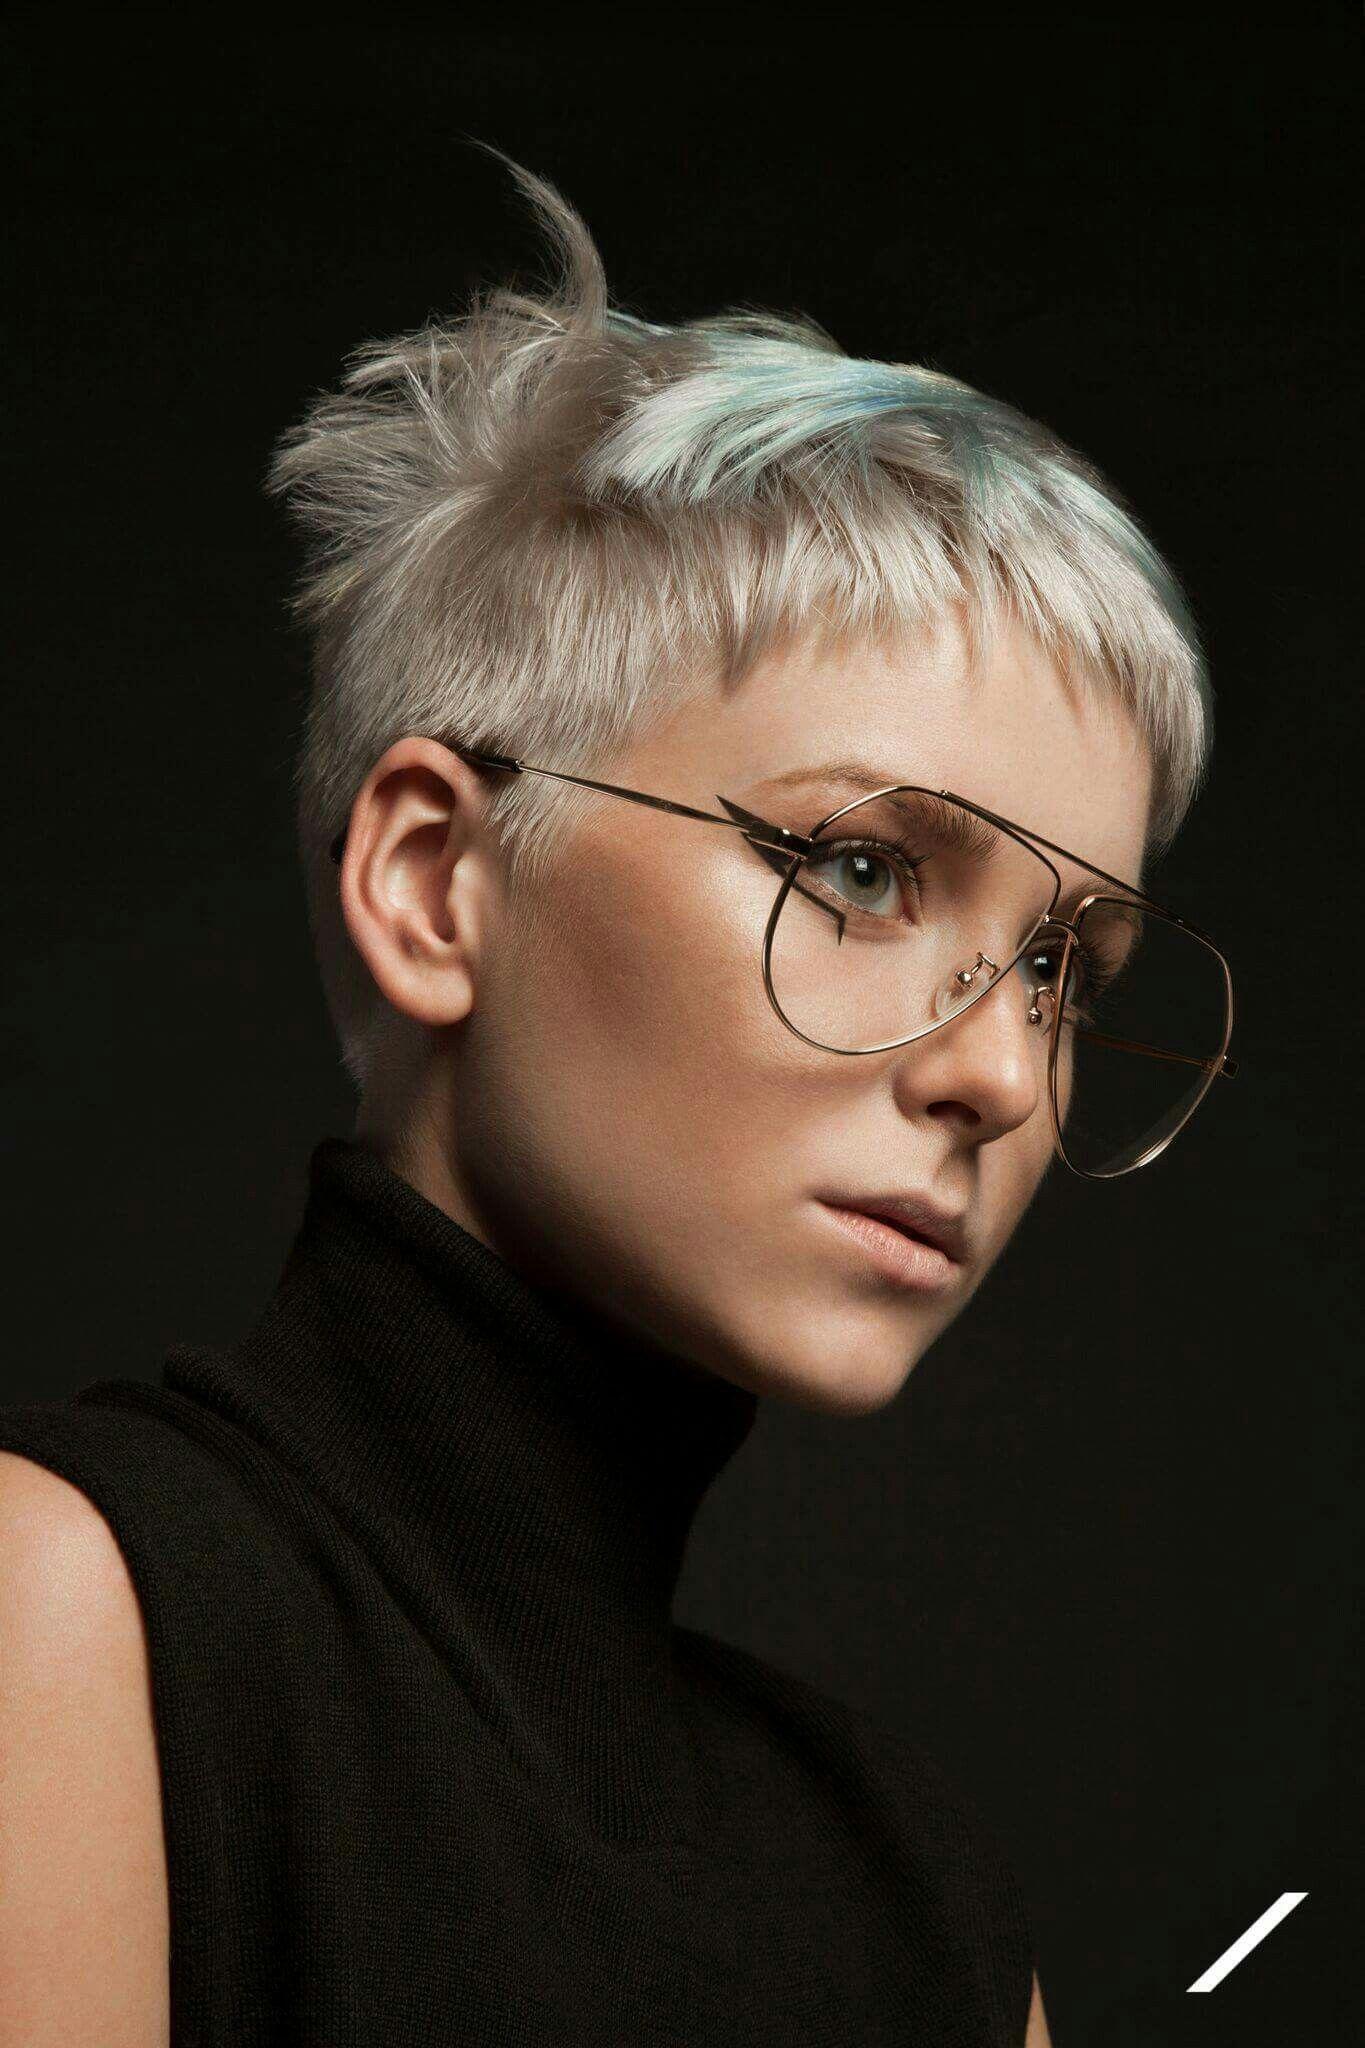 Pin Van S M B L Op Brillen Kapsels Korte Kapsels Kapsel Ideeen